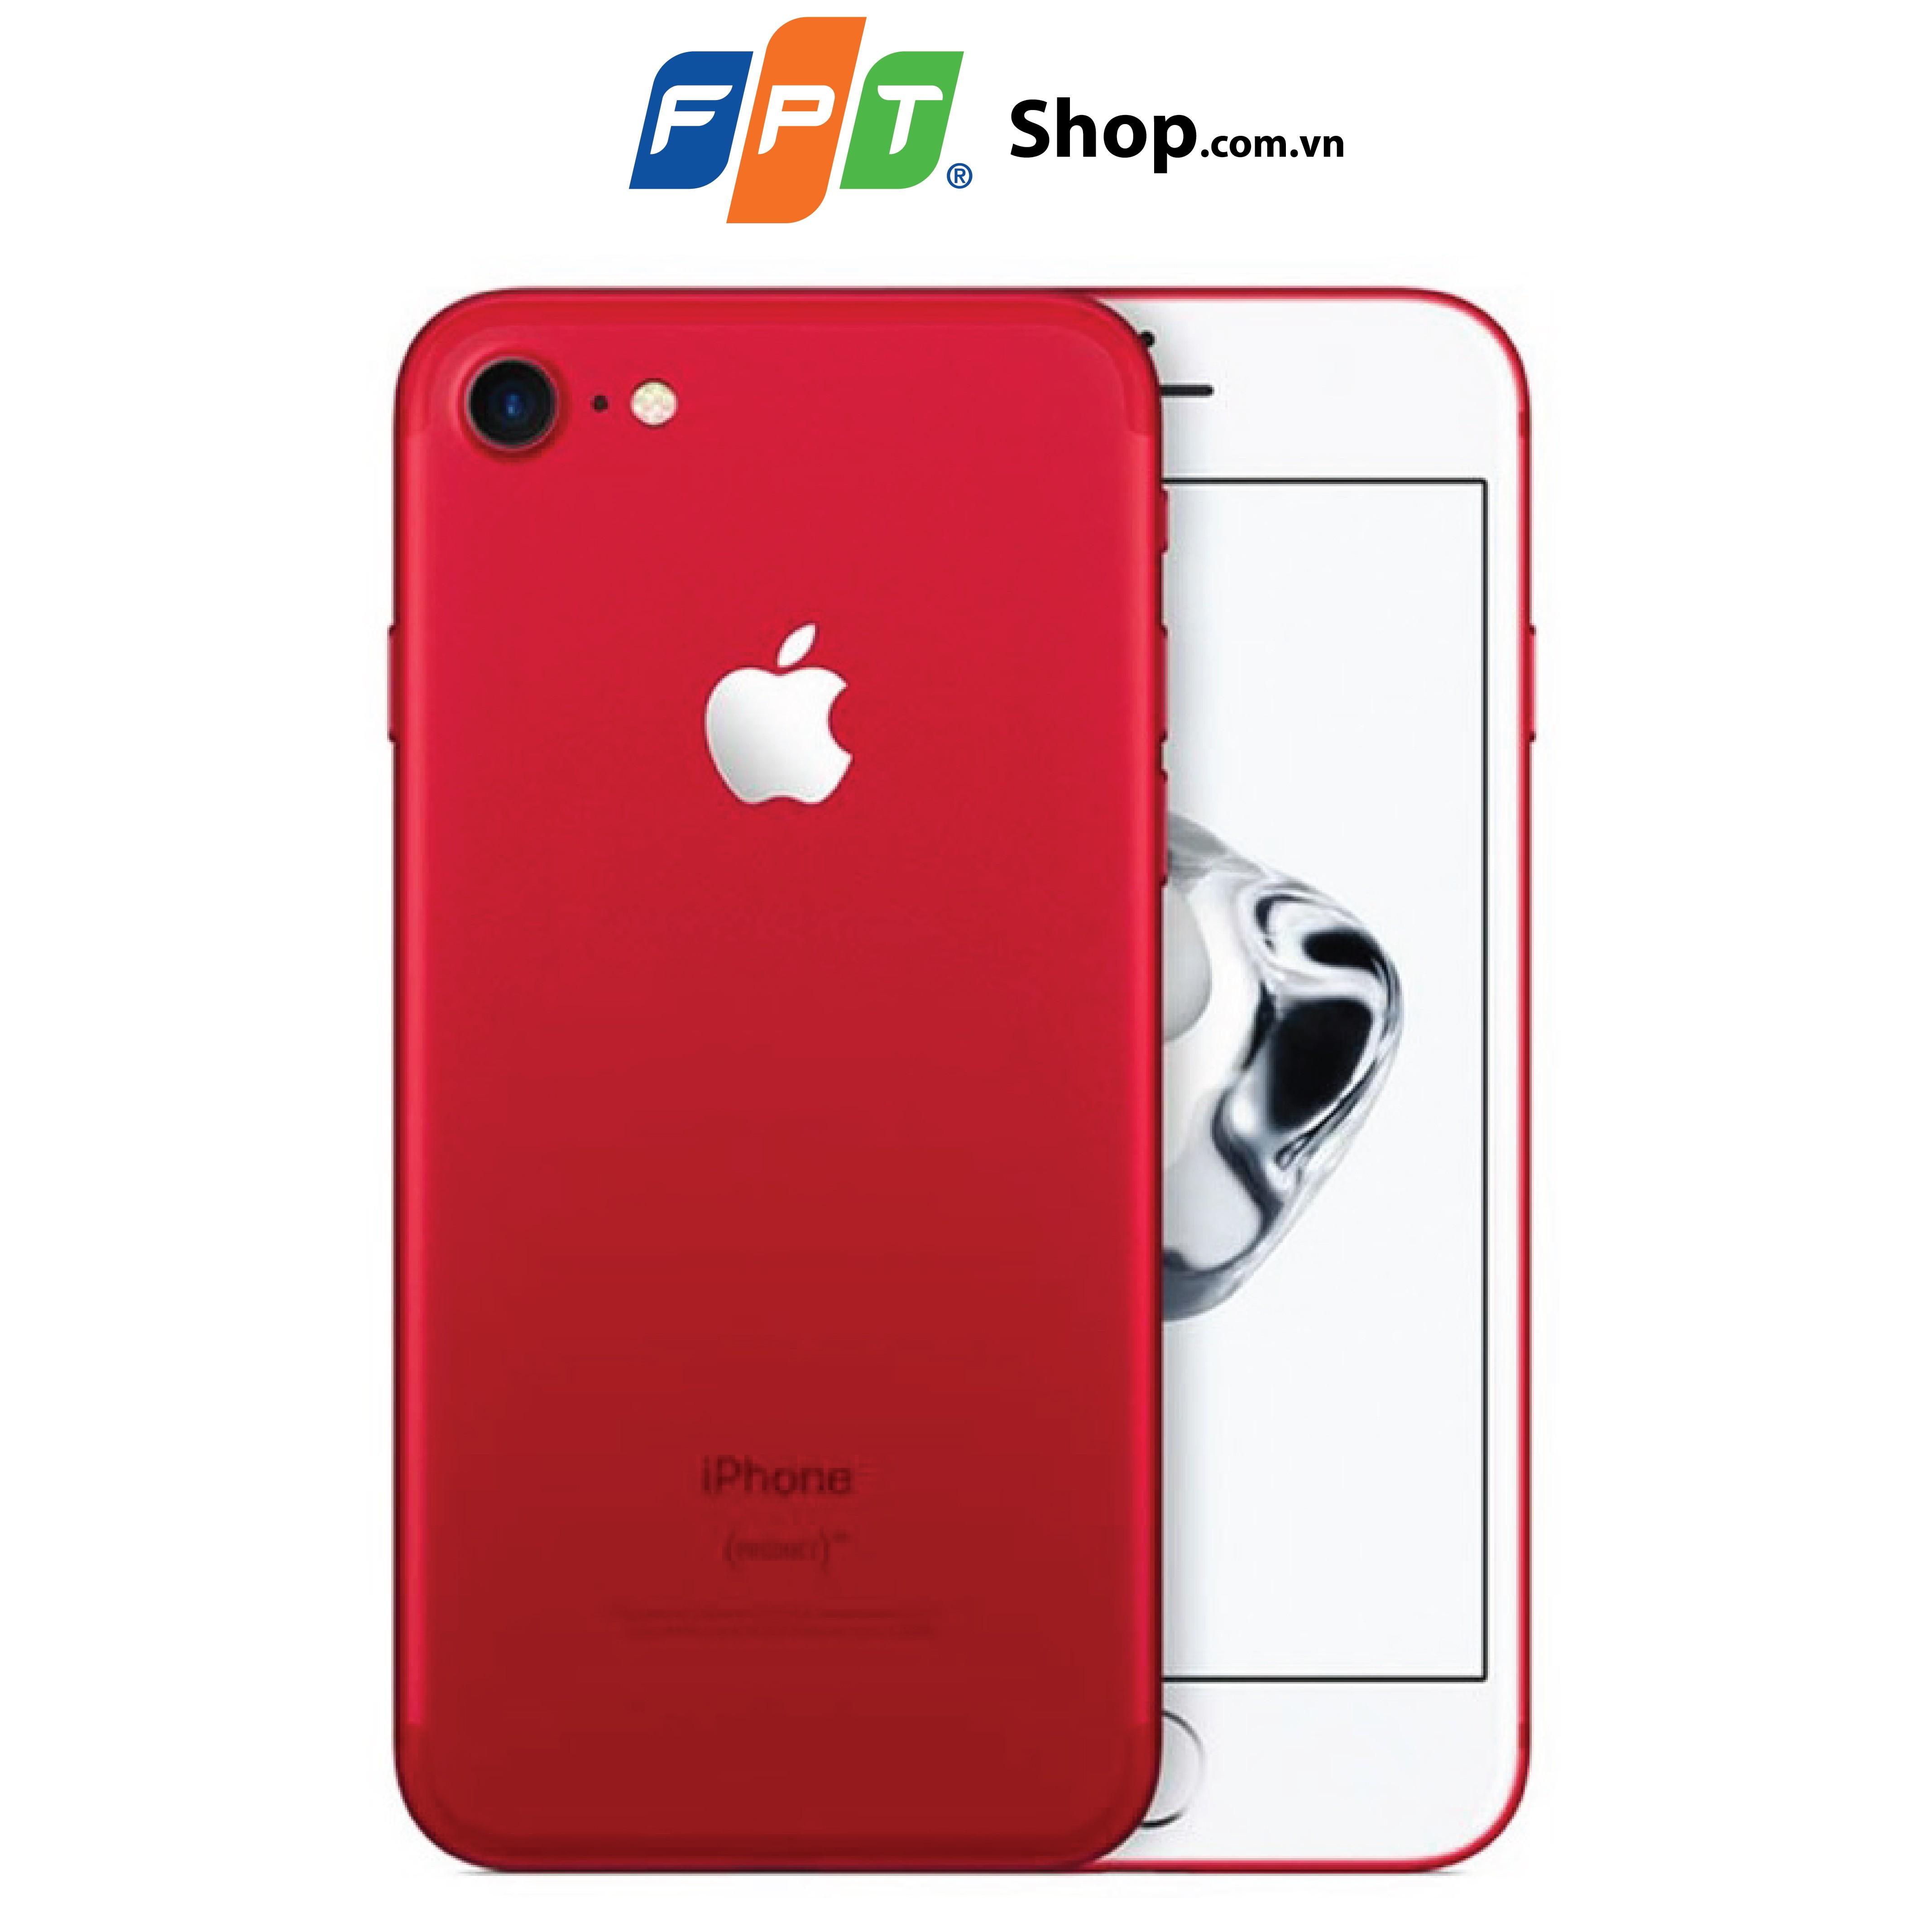 iPhone 7 256GB Red - No.00338181 | Sendo.vn